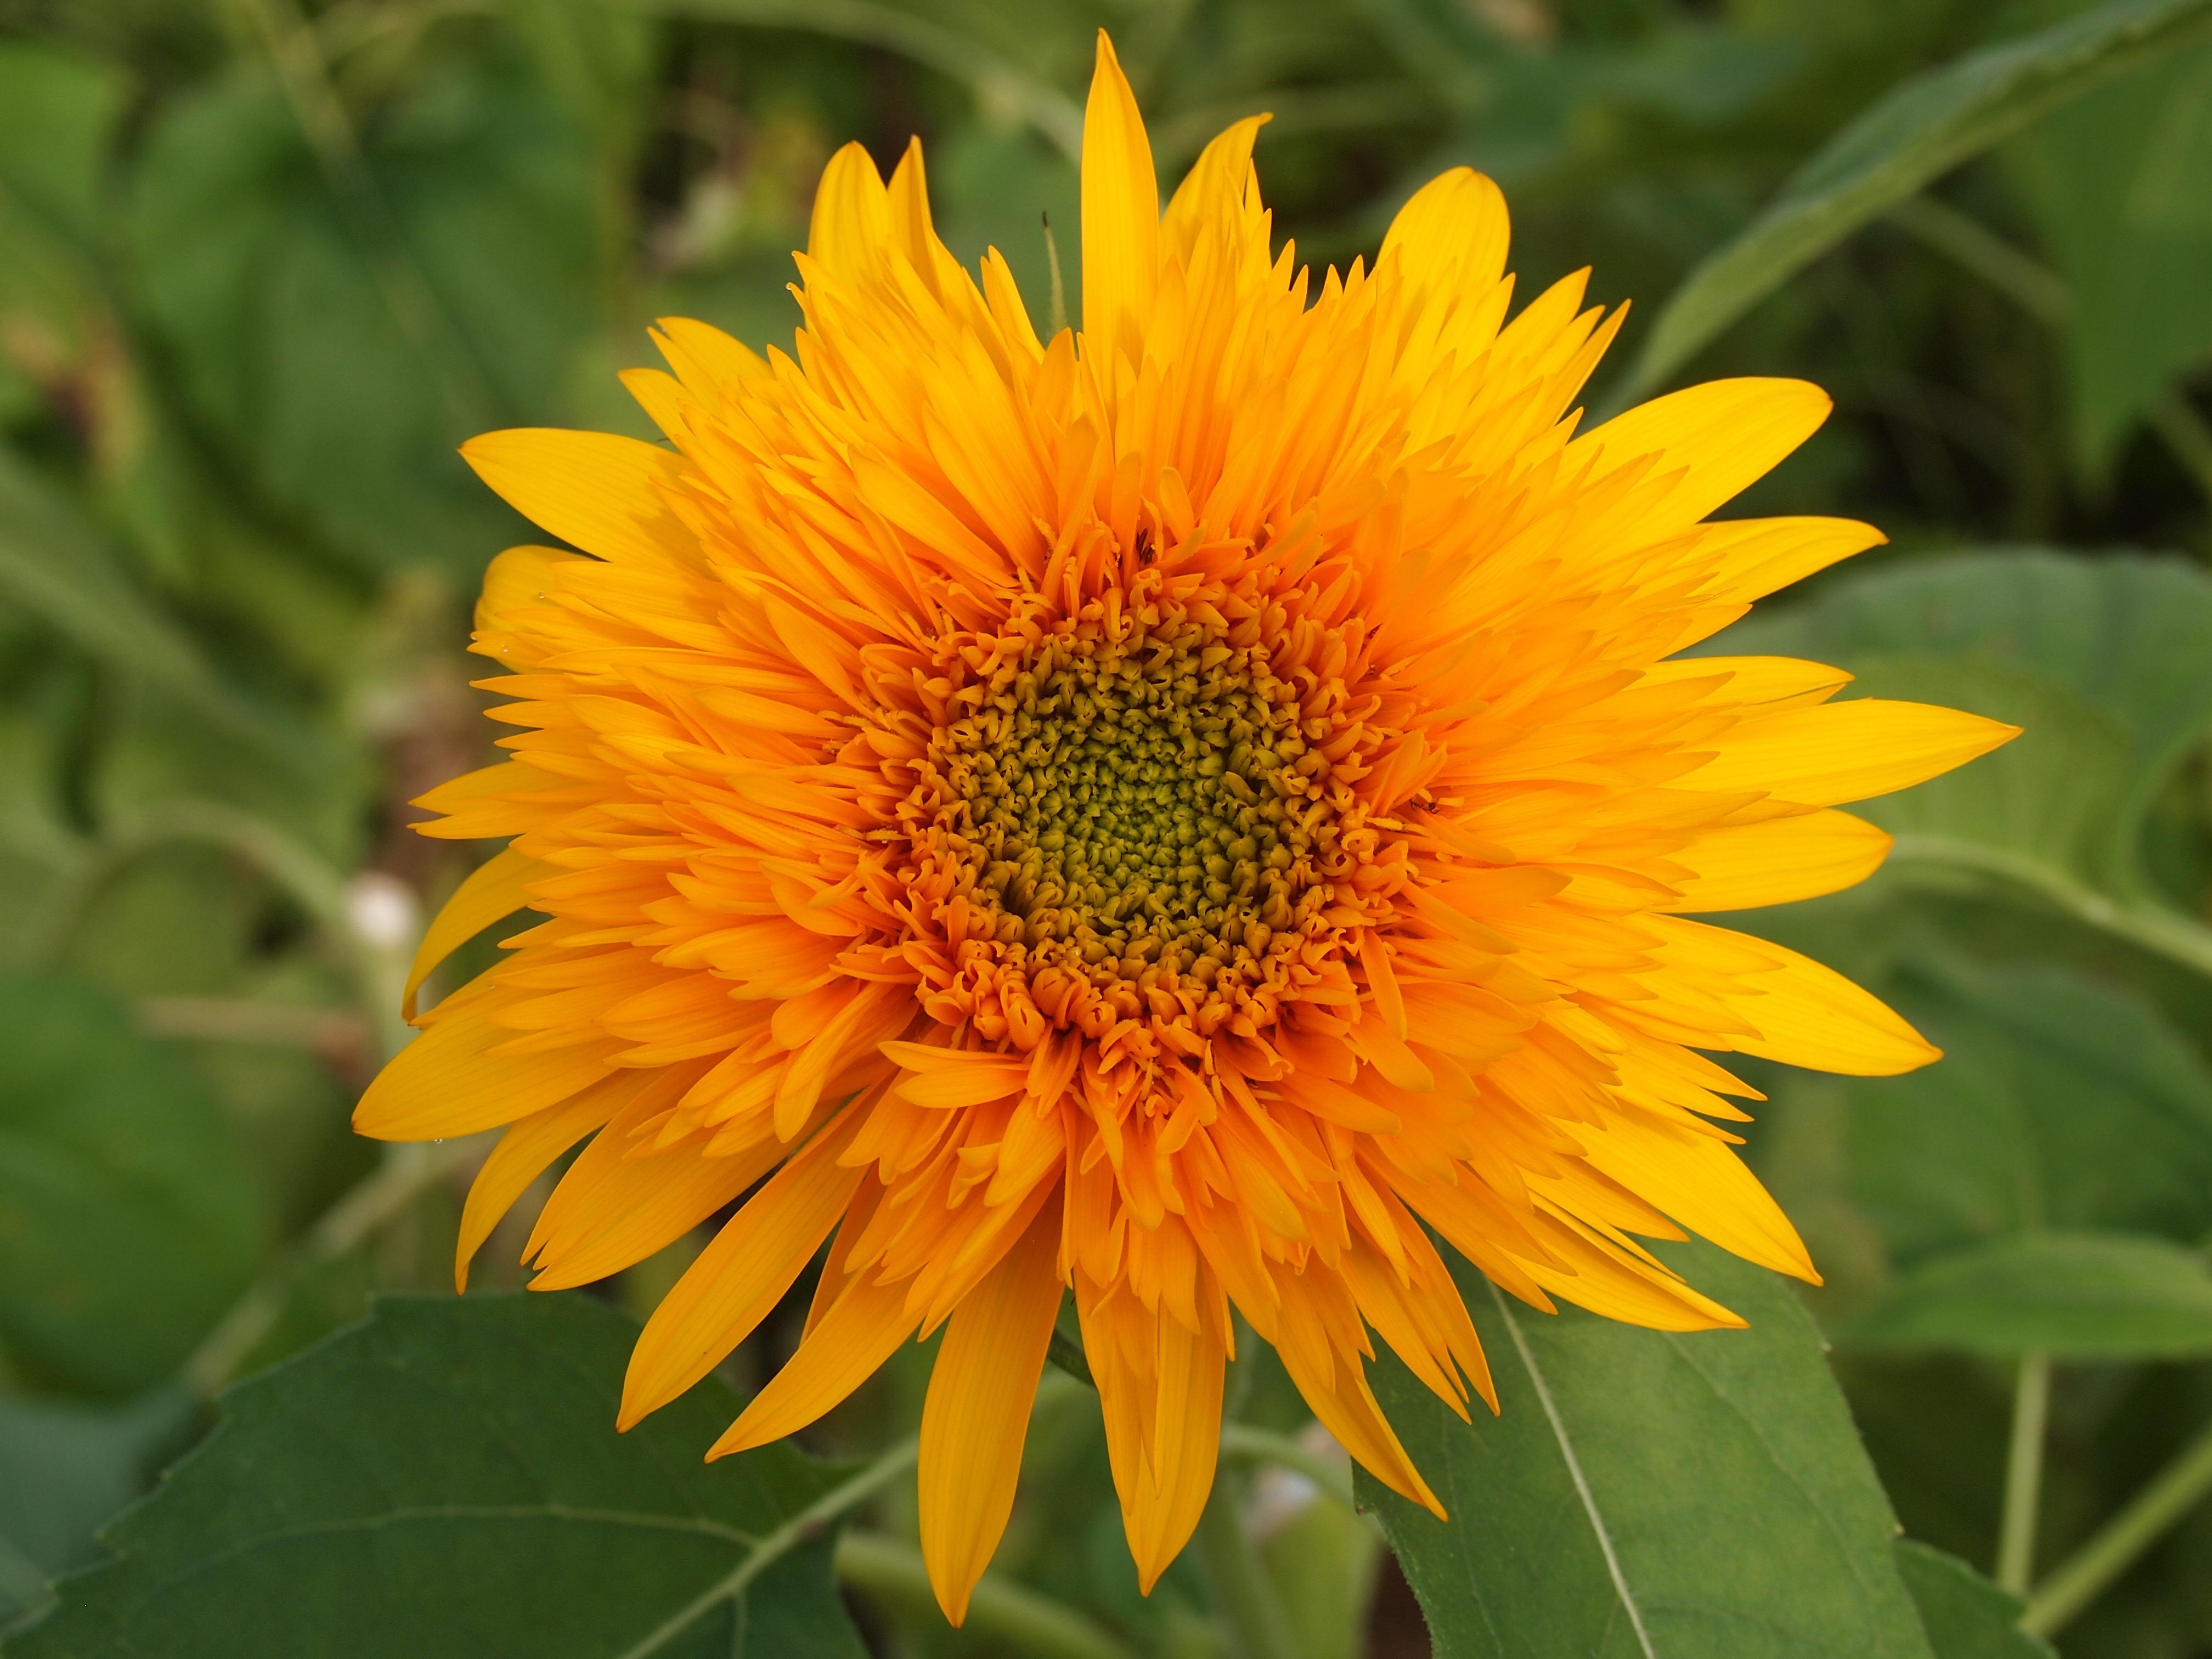 kostenlose foto blume bl tenblatt sommer botanik gelb garten flora sonnenblume. Black Bedroom Furniture Sets. Home Design Ideas